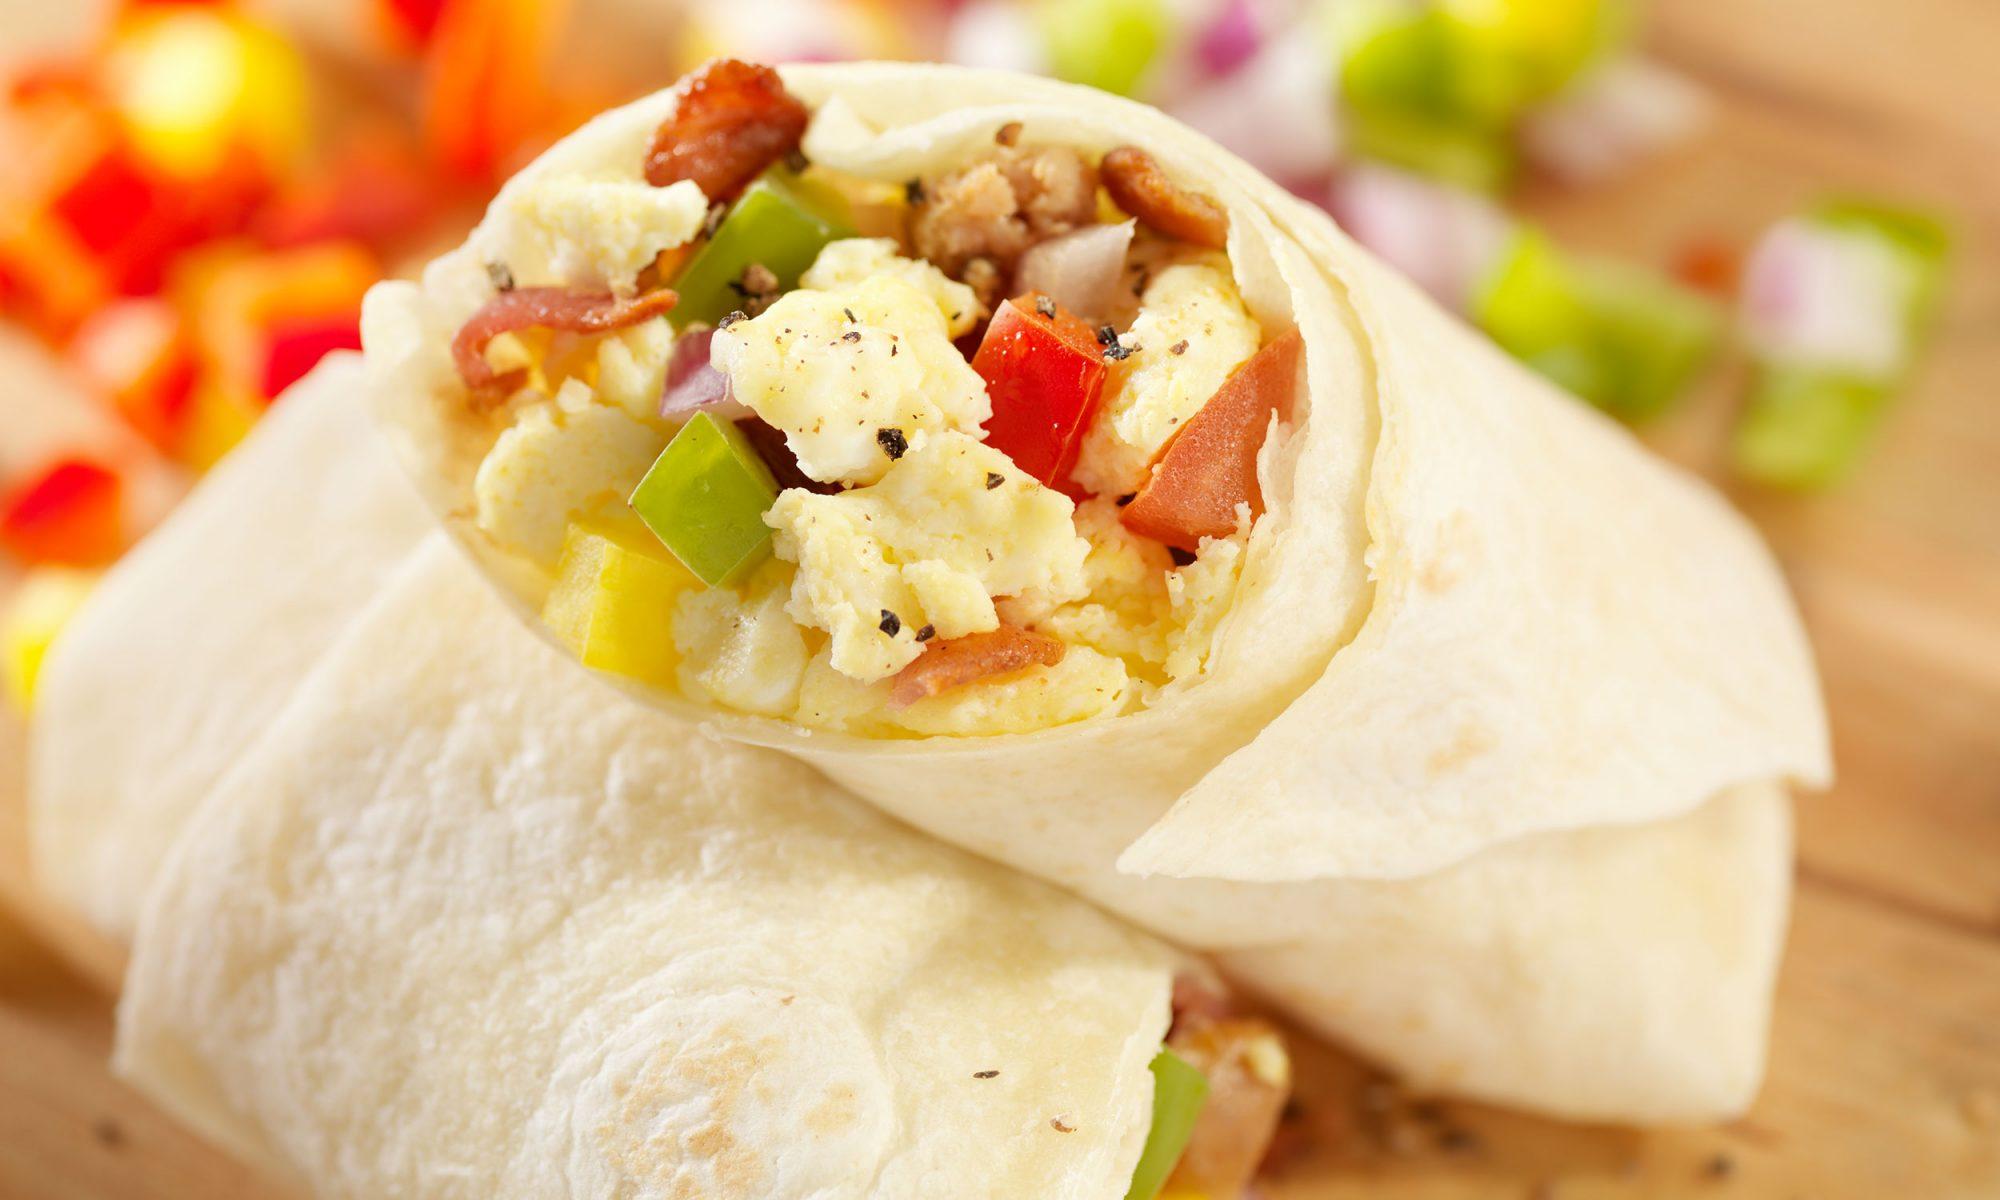 denver breakfast burrito day